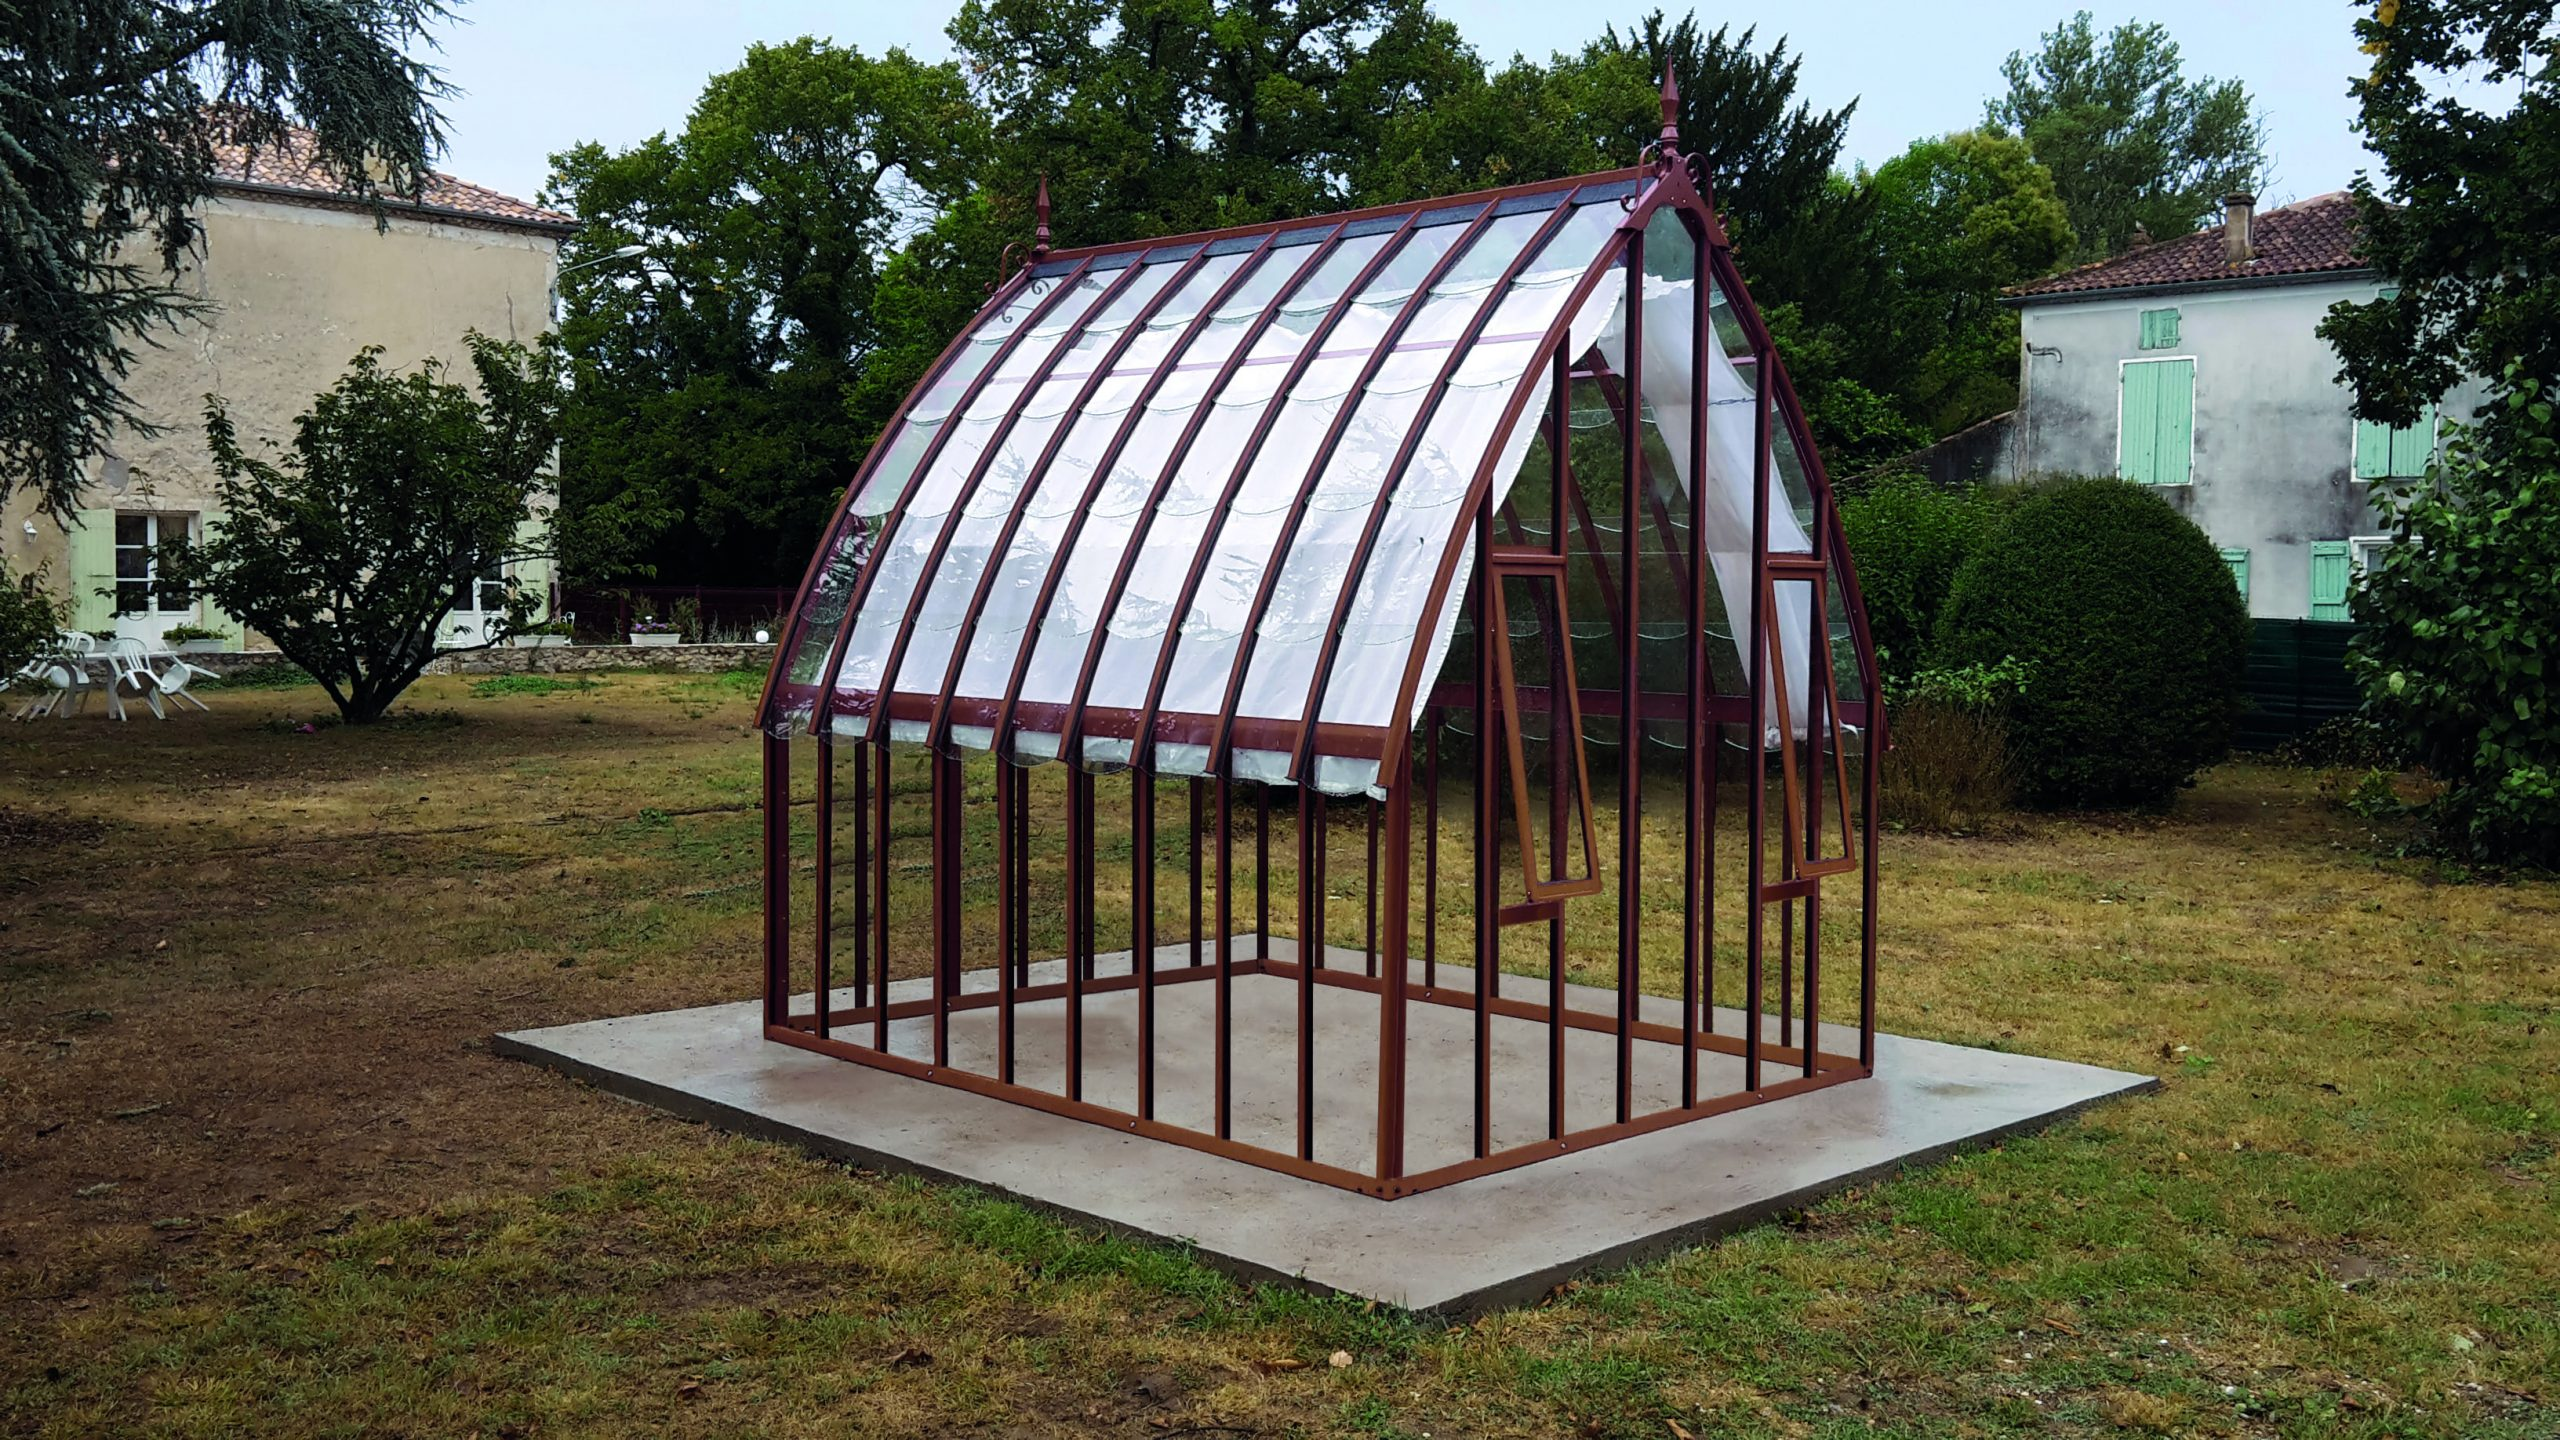 Serre À L'ancienne Style Fer Forgé - Aluminium - Verre ... avec Serre De Jardin Occasion